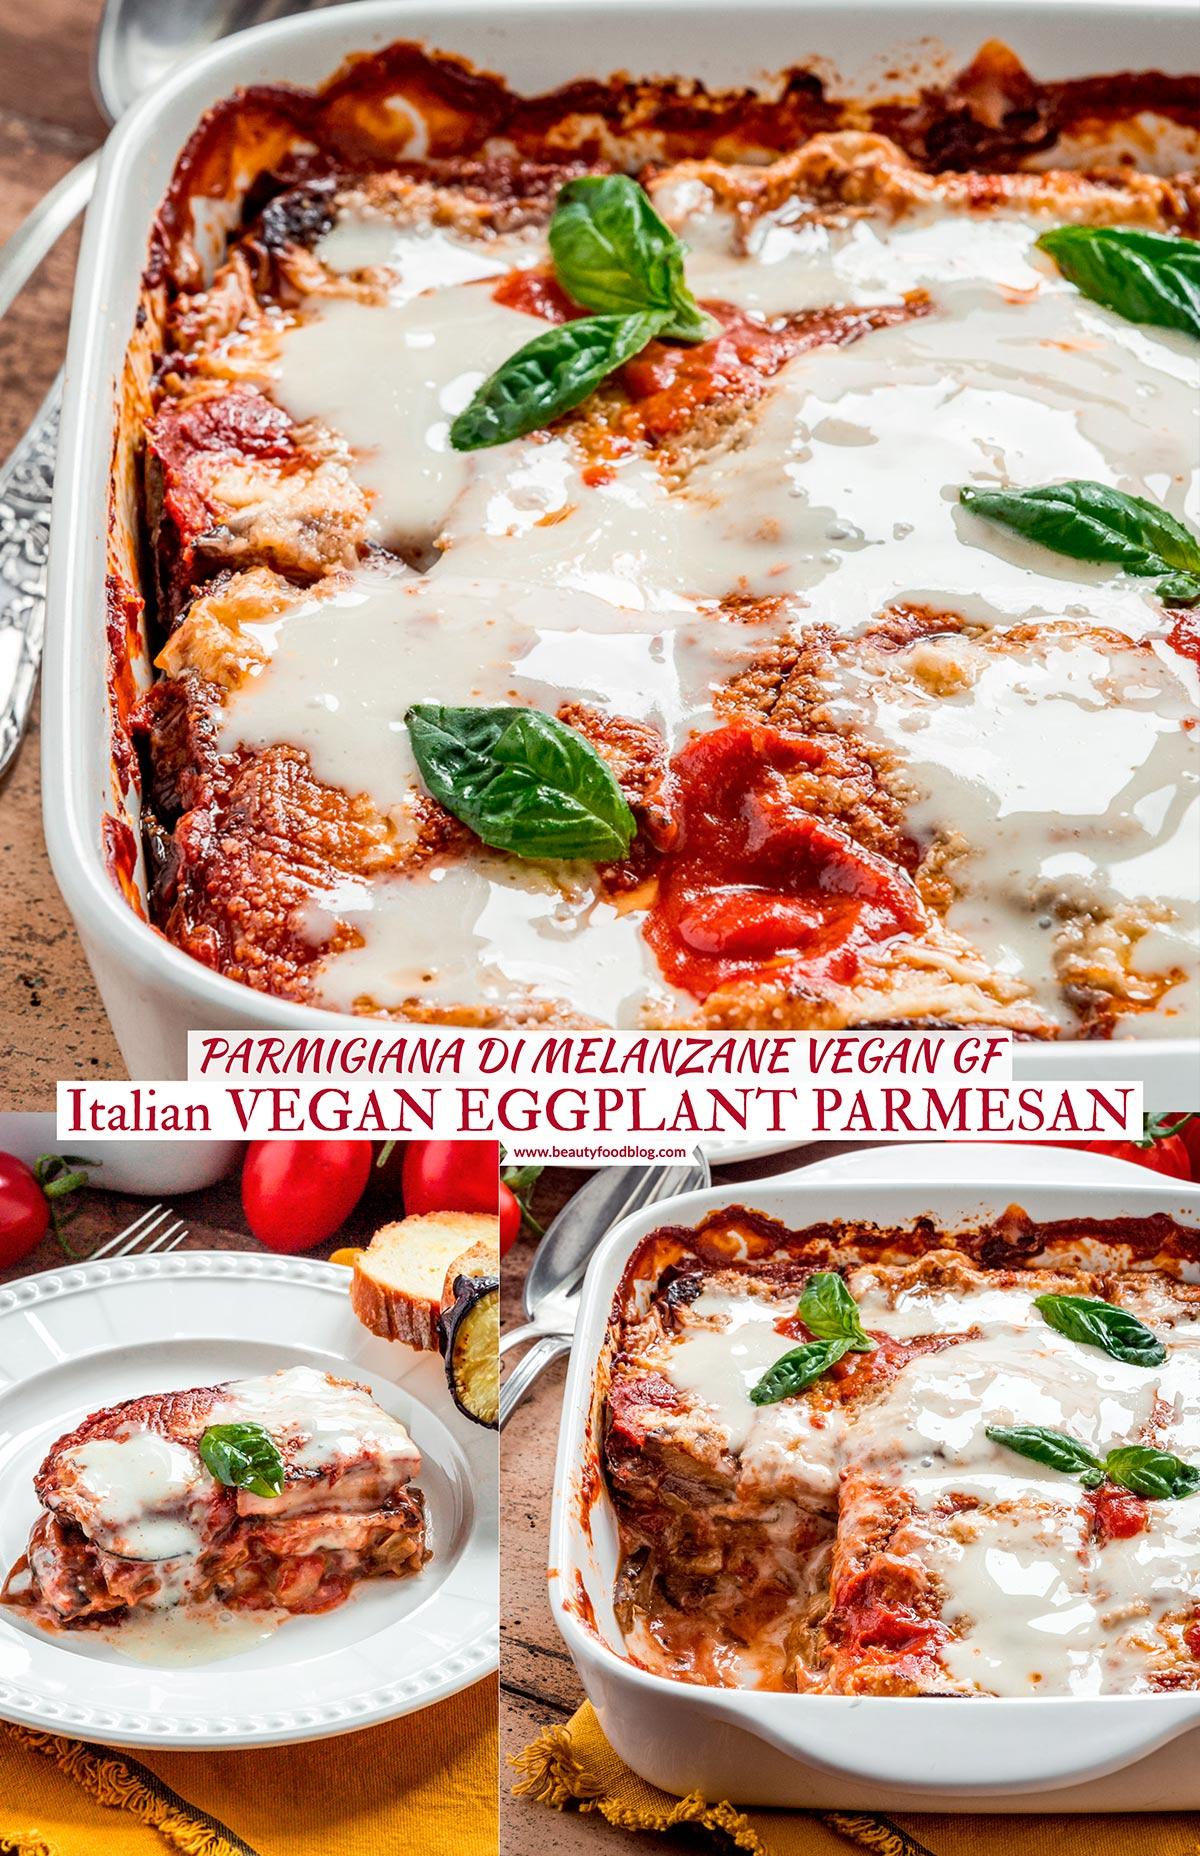 Italian Vegan EGGPLANT PARMESAN recipe with homemade vegan mozzarella and vegan parmesan MELANZANE alla PARMIGIANA VEGAN LIGHT al FORNO con mozzarella vegan fatta in casa e parmigiano vegan